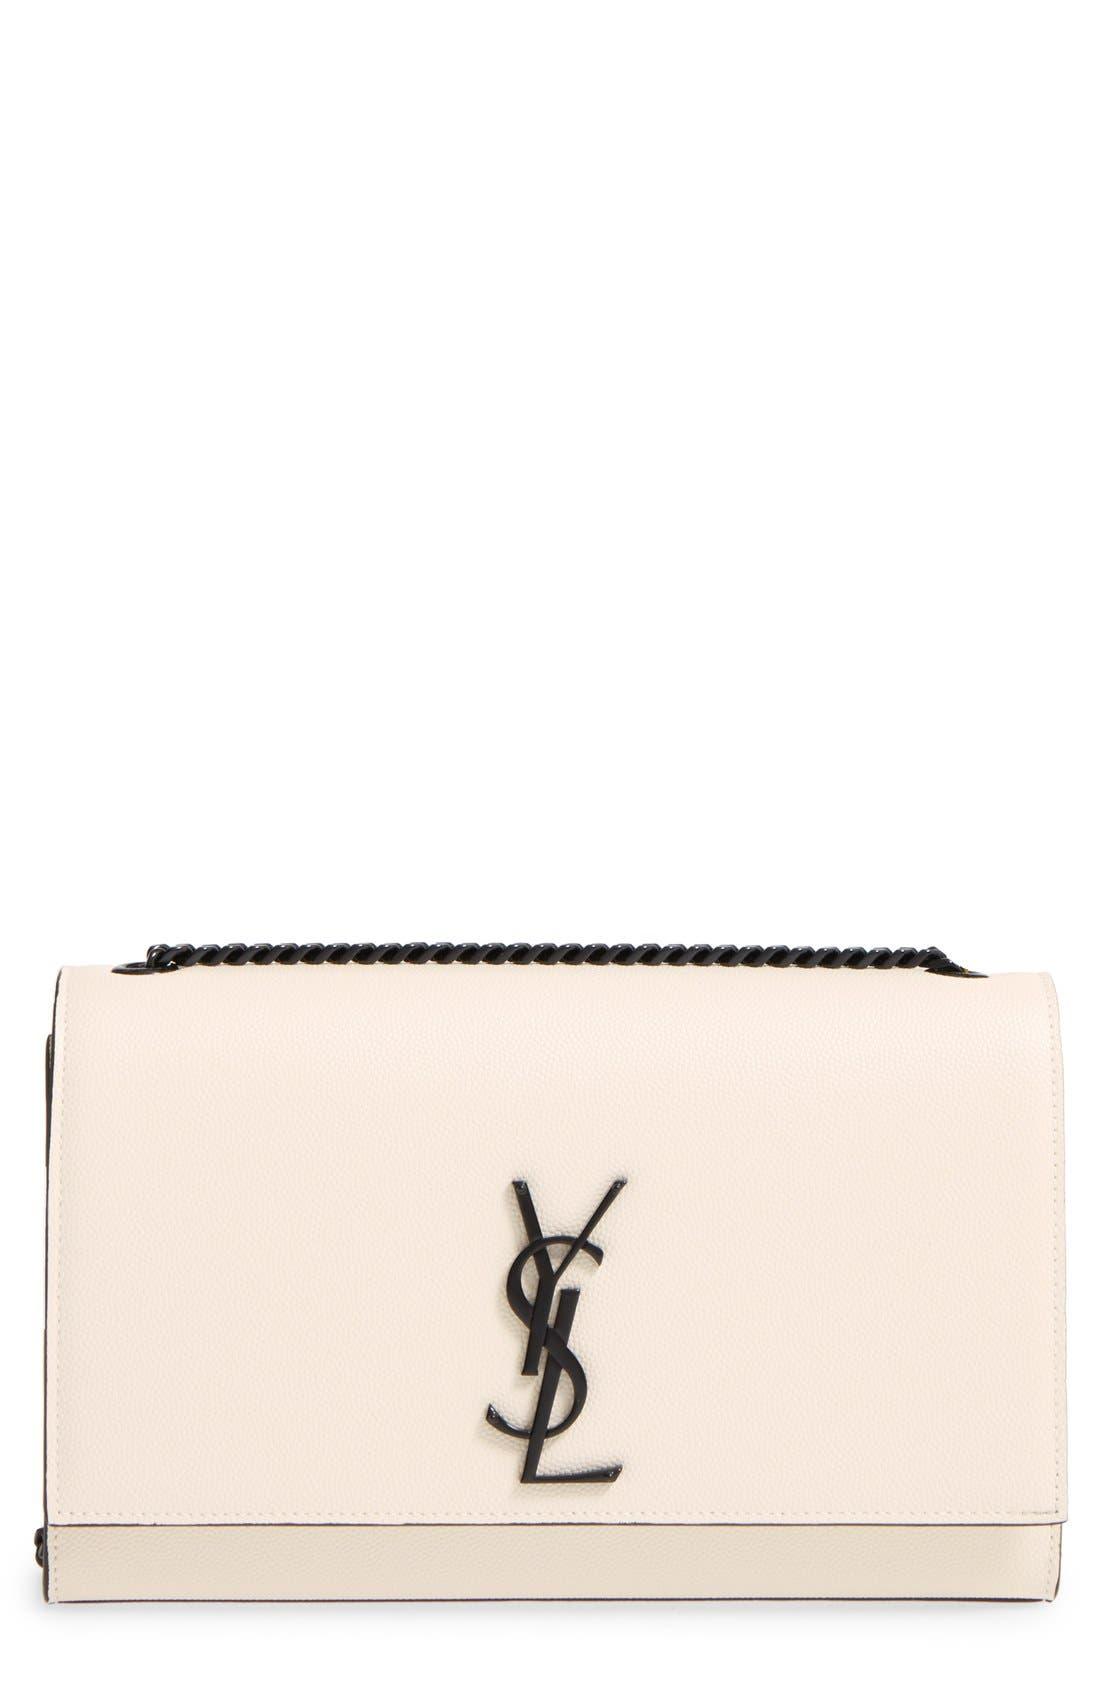 Main Image - Saint Laurent 'Medium Kate' Calfskin Leather Crossbody Bag